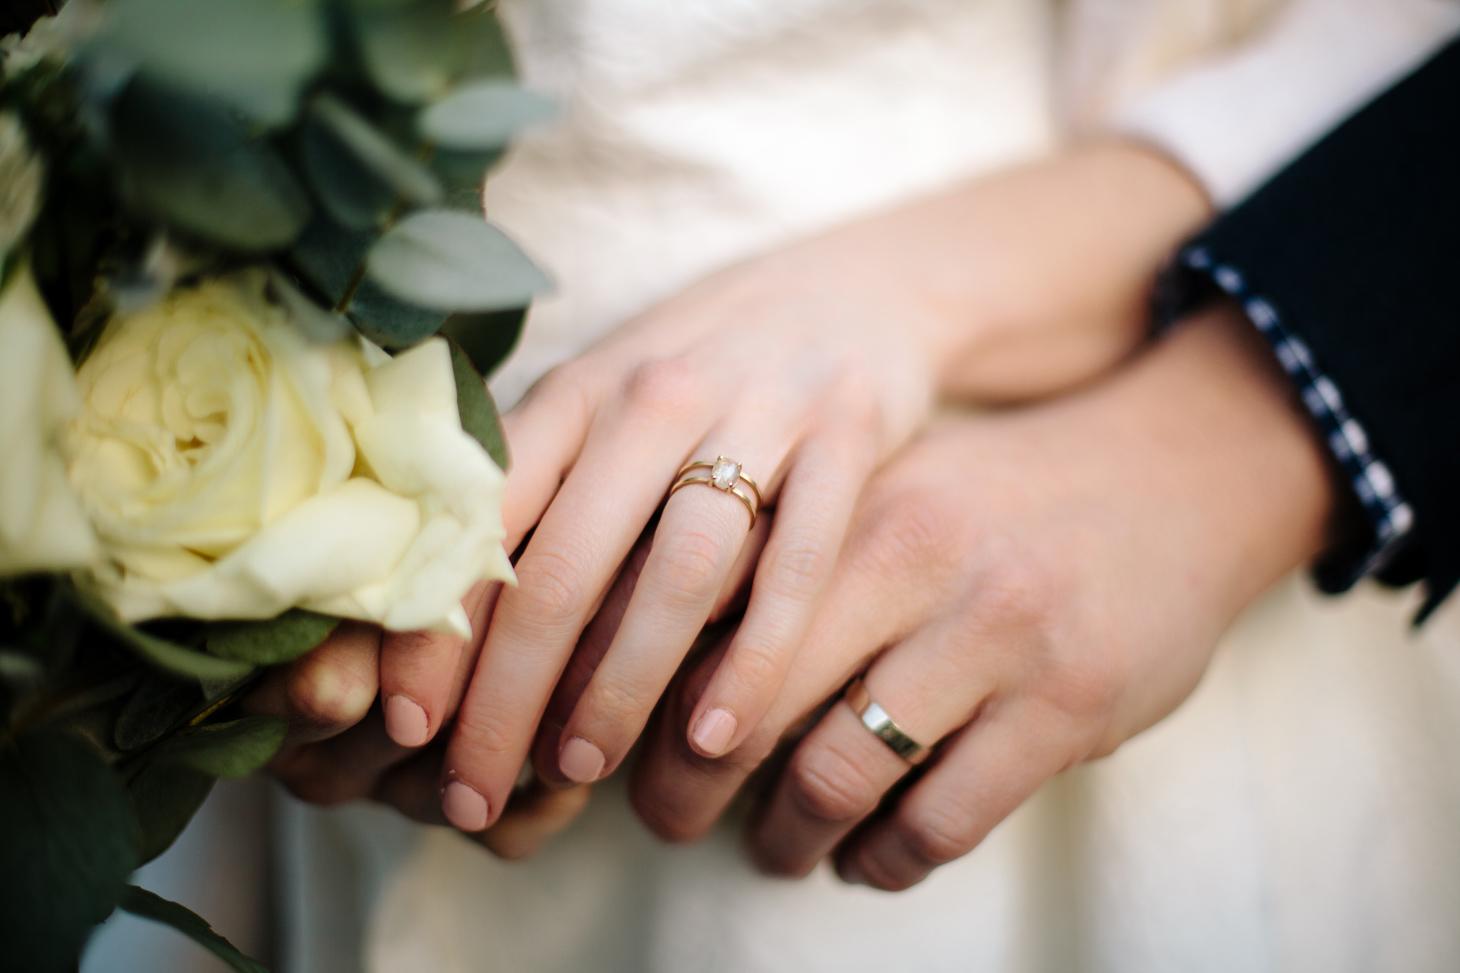 007-NYC-New-York-Central-Park-Elopement-Wedding-SmittenChickens-Photographer-.jpg